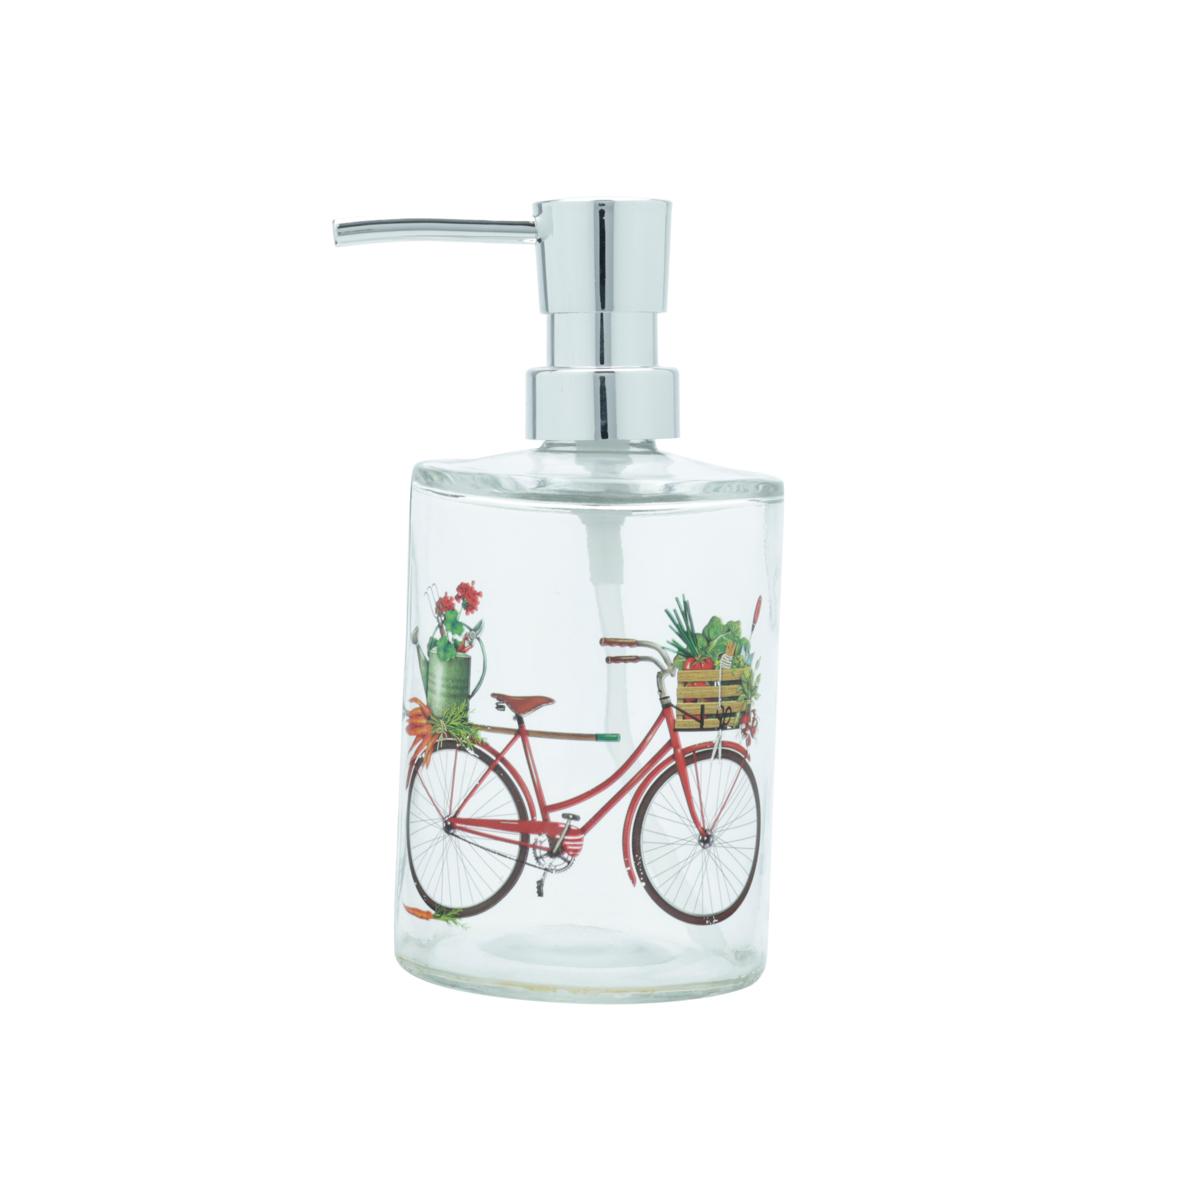 Porta sabonete líquido vidro Bike and Flower vermelho Urban